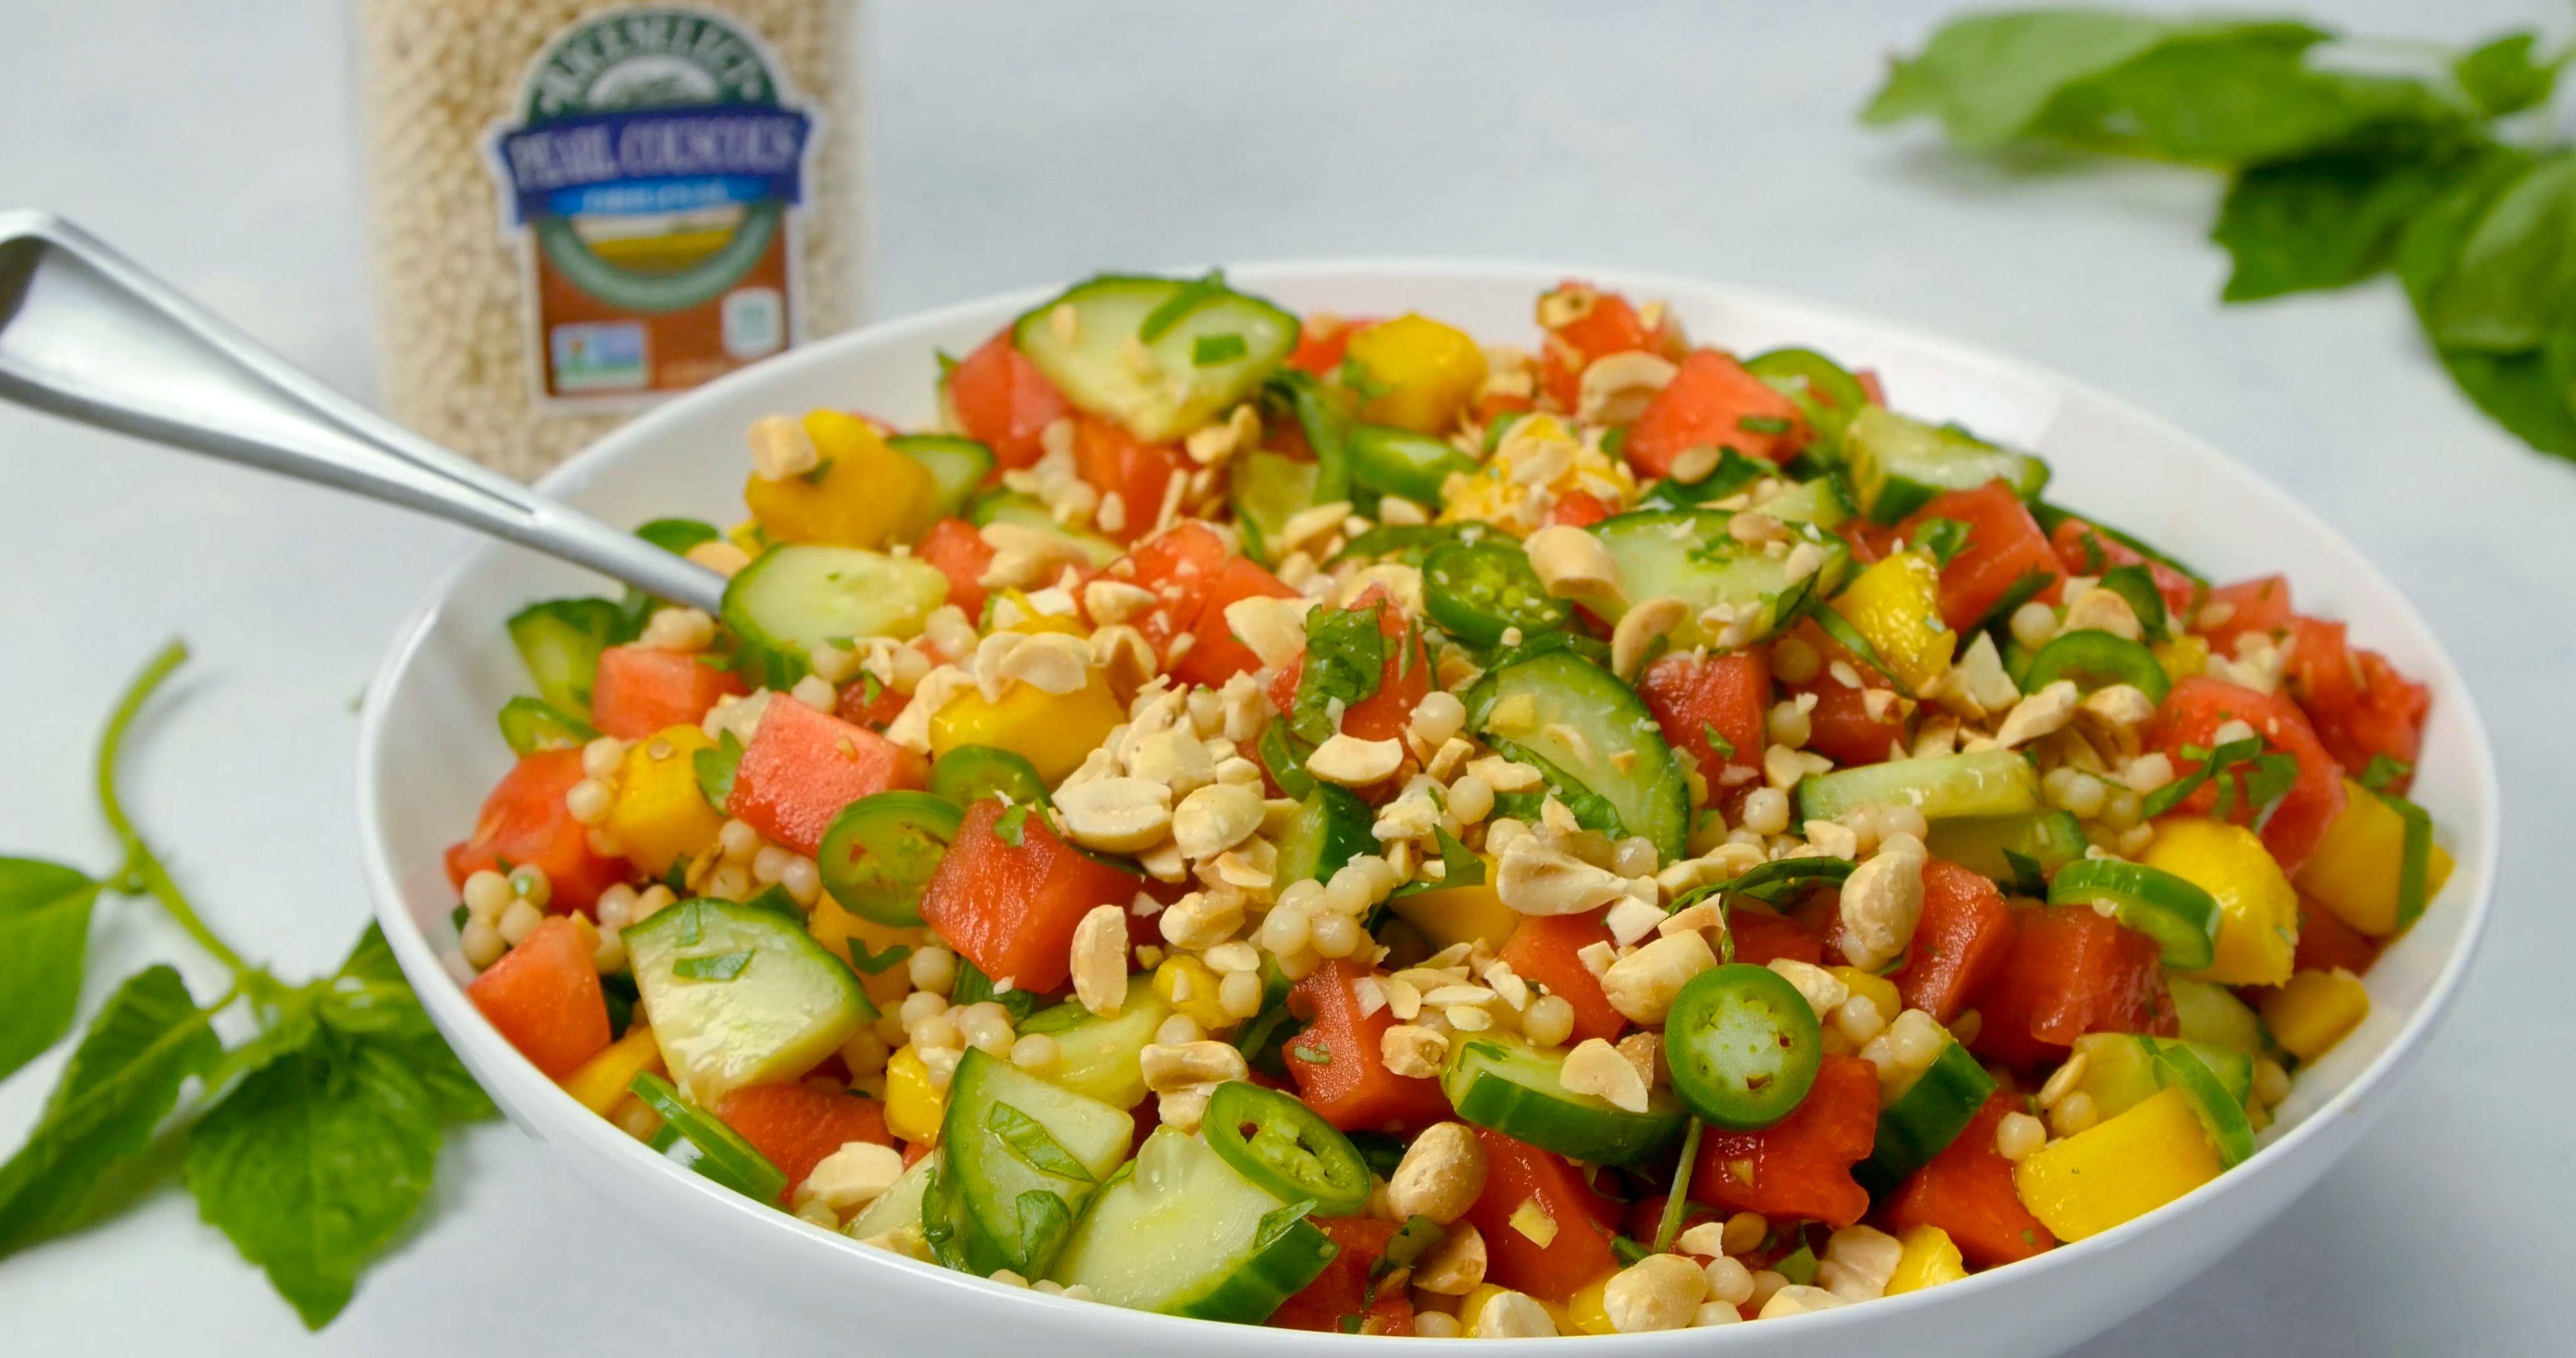 Watermelon Strawberry Cucumber Salad - Aberdeens Kitchen   Recipe   Healthy recipes, Recipes, Food